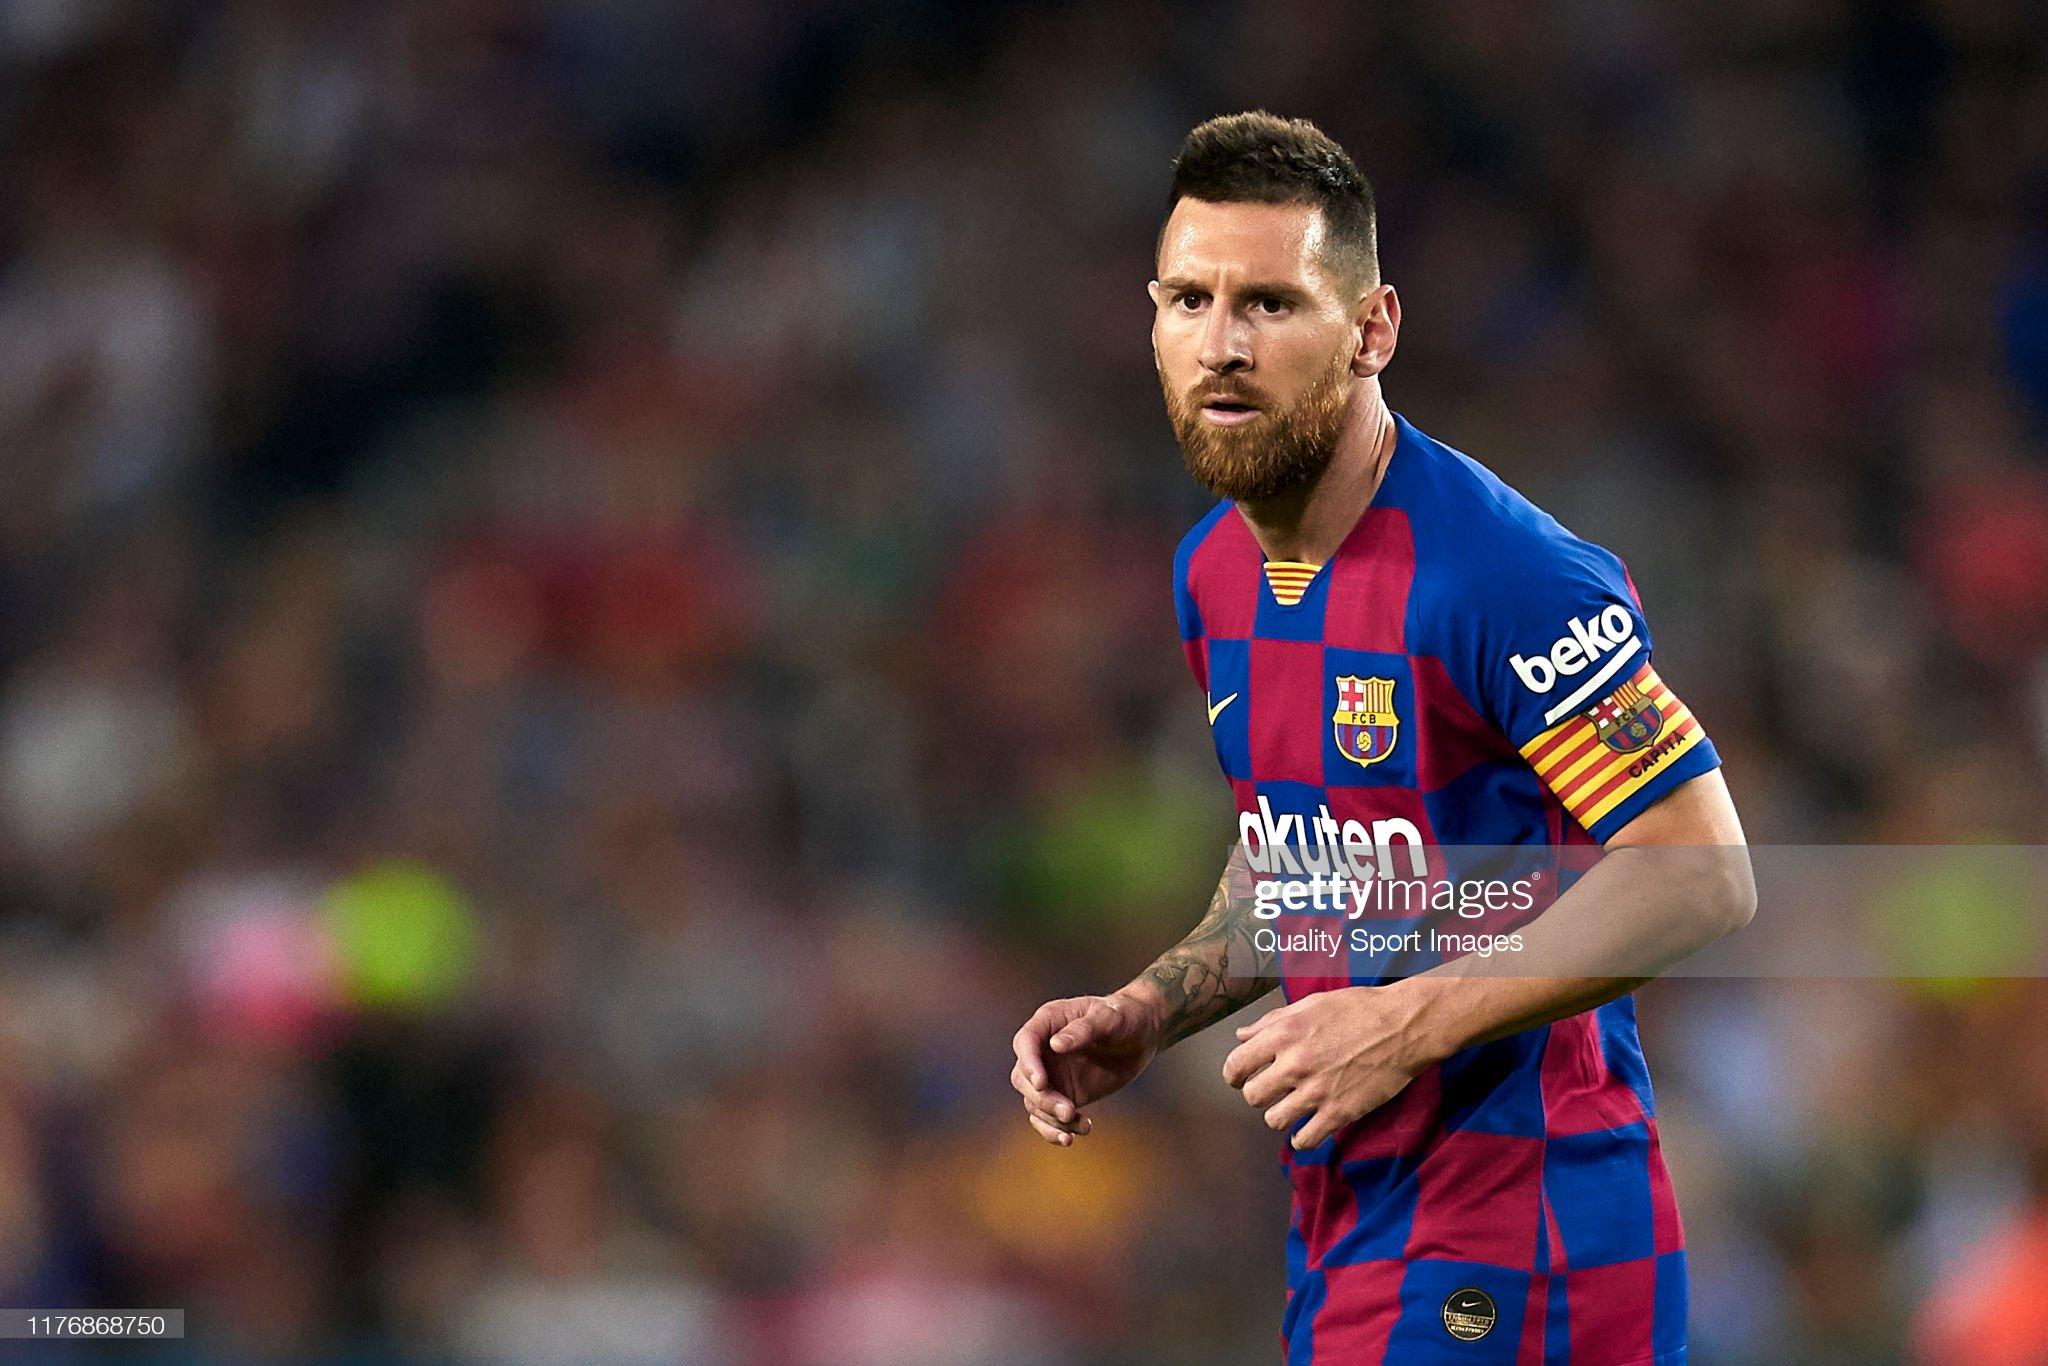 صور مباراة : برشلونة - فياريال 2-1 ( 24-09-2019 )  Lionel-messi-of-fc-barcelona-looks-on-during-the-liga-match-between-picture-id1176868750?s=2048x2048